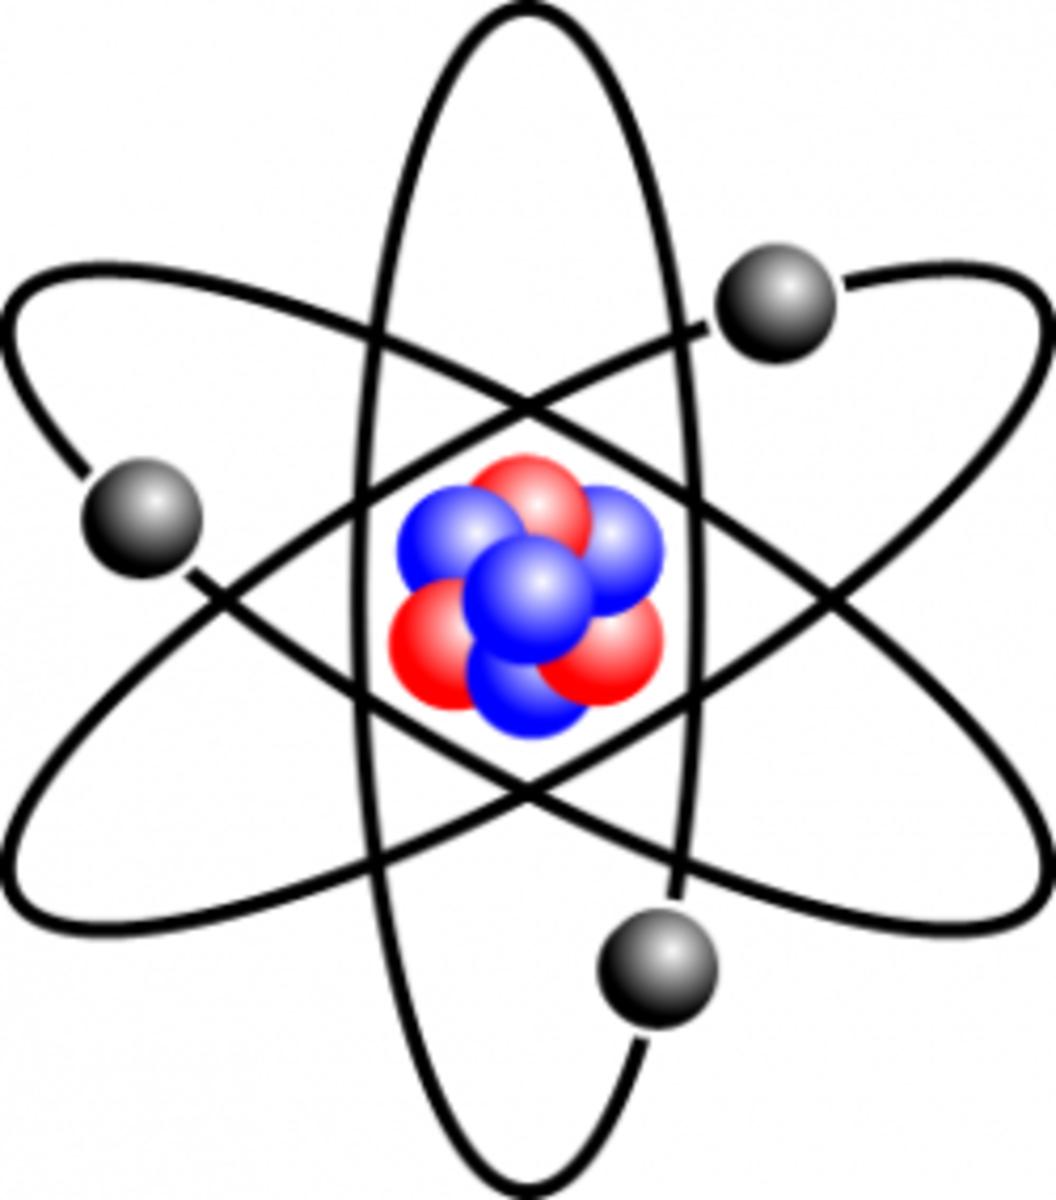 Image of lithium atom by Halfdan, under Creative Common license.